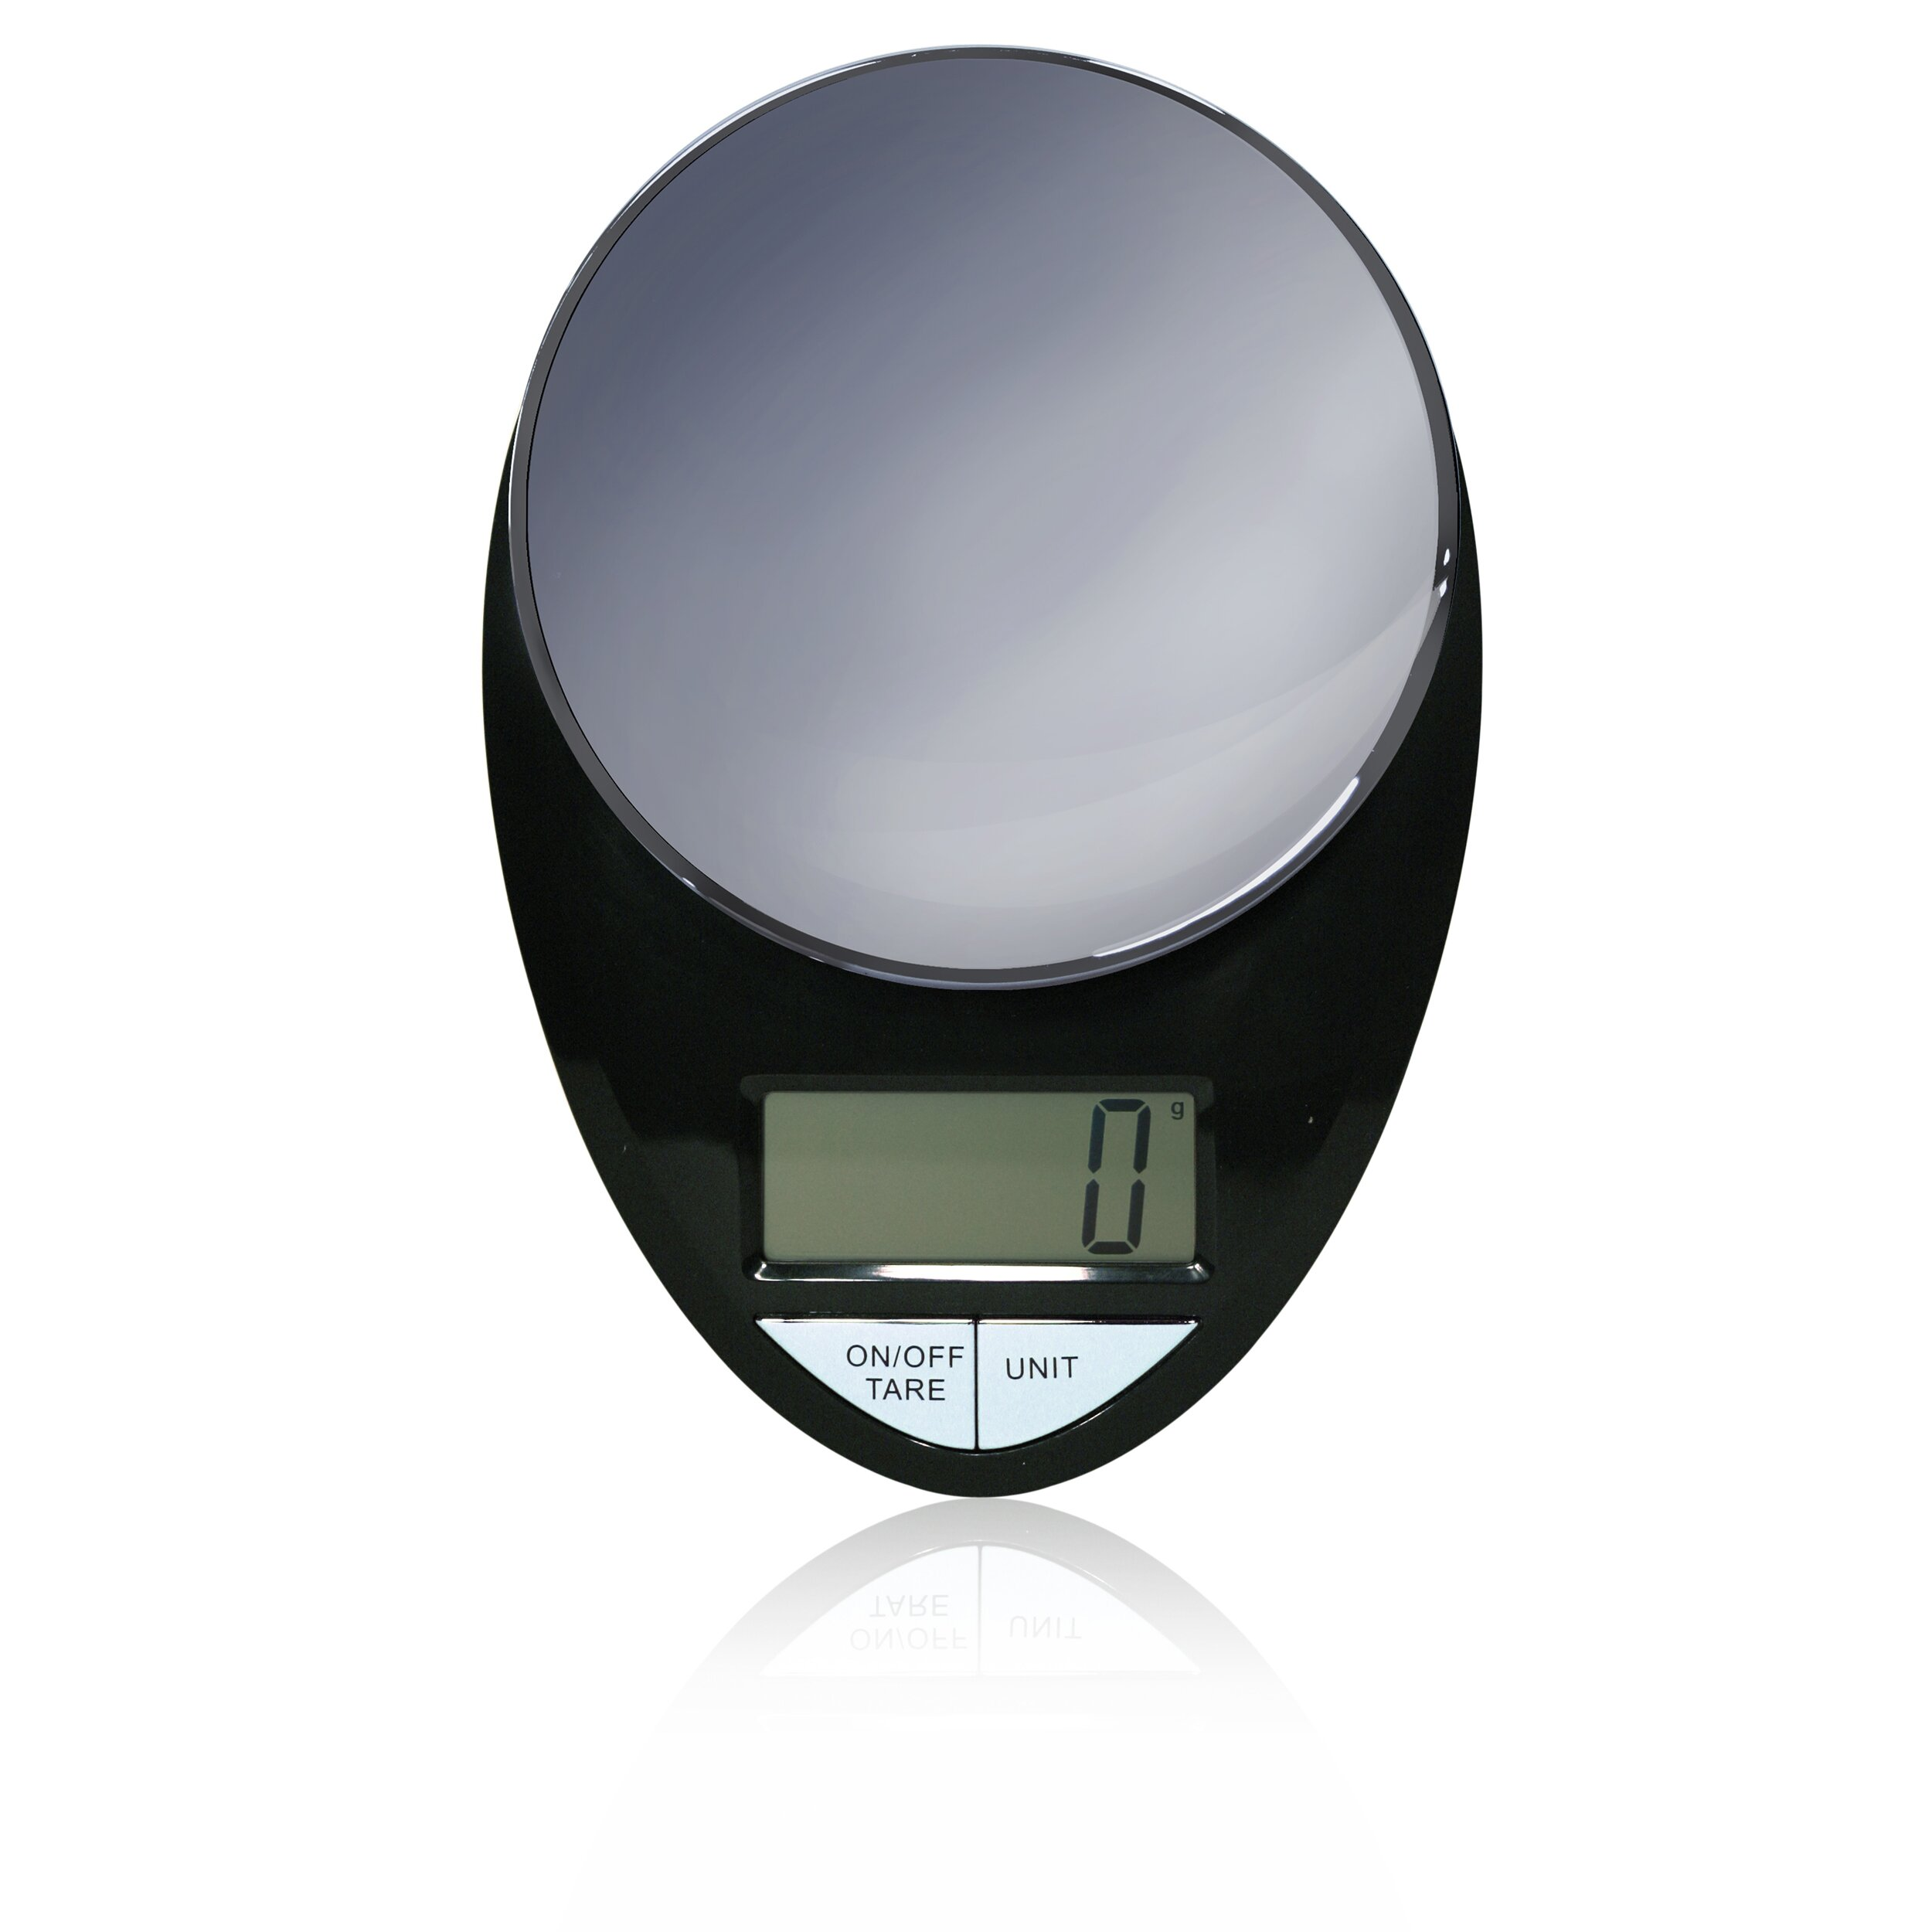 eatsmart precision digital bathroom scale accuracy  bathroom ideas, Bathroom decor